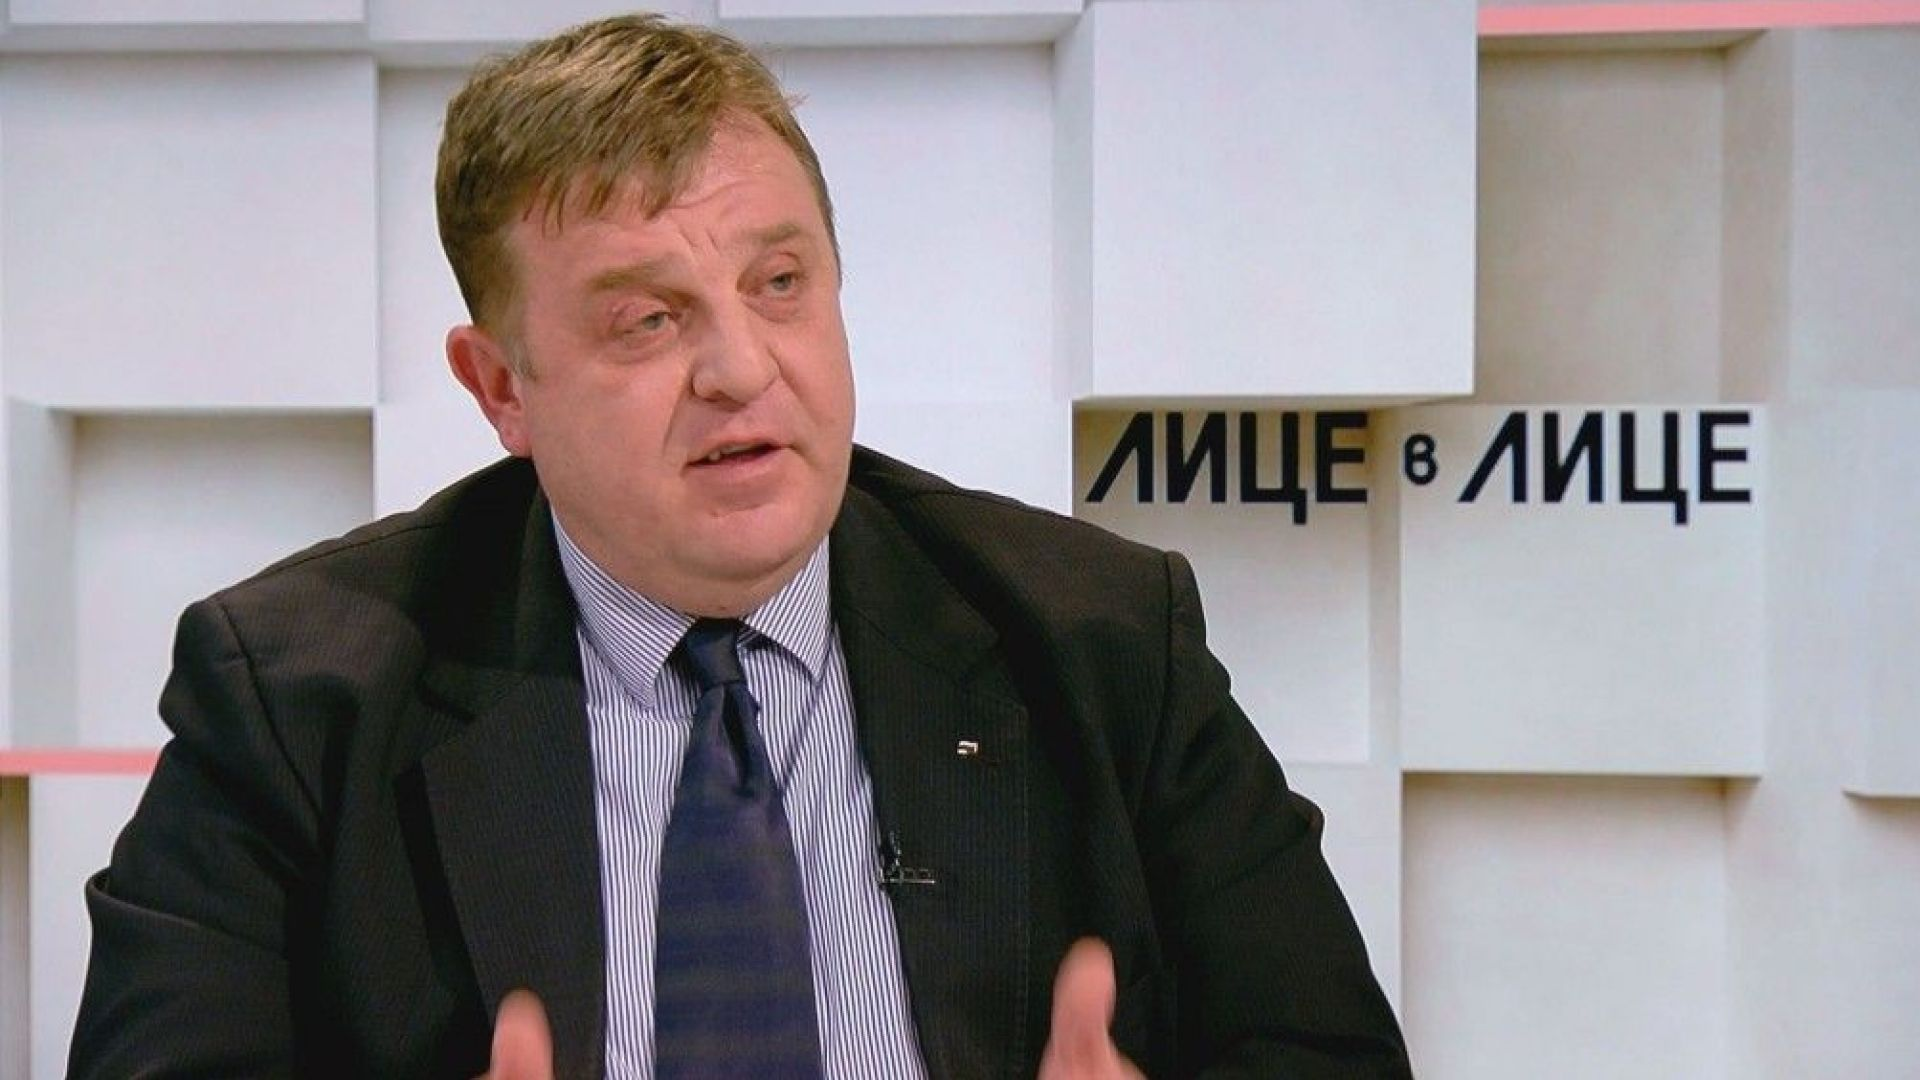 Красимир Каракачанов: Когато видях пребития военен, полудях